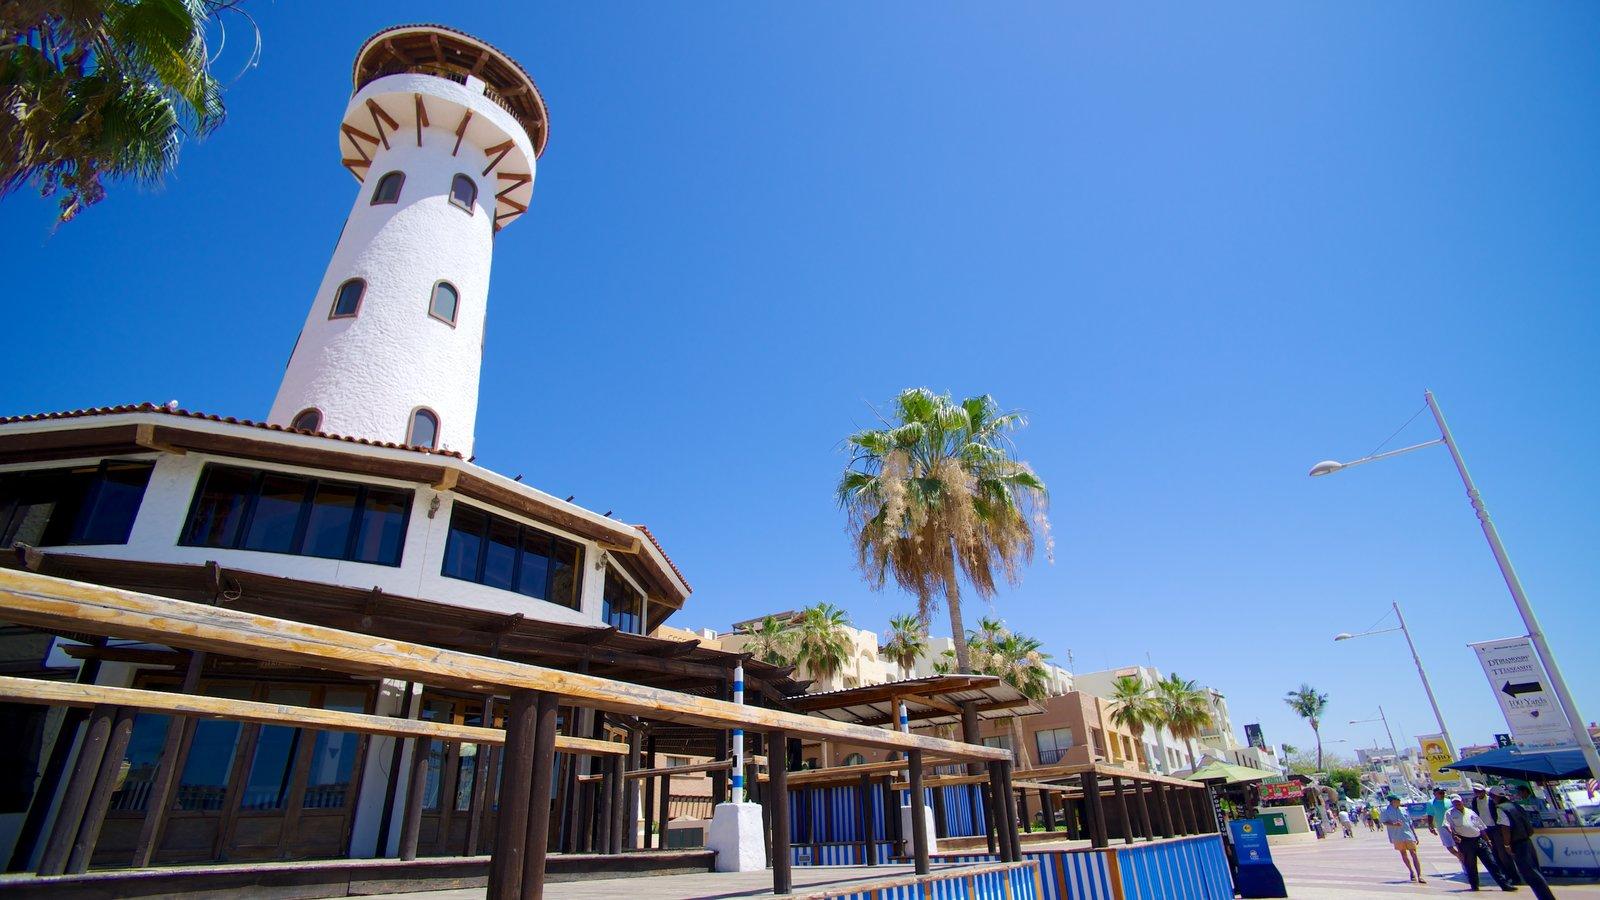 Marina Cabo San Lucas featuring a coastal town and a lighthouse